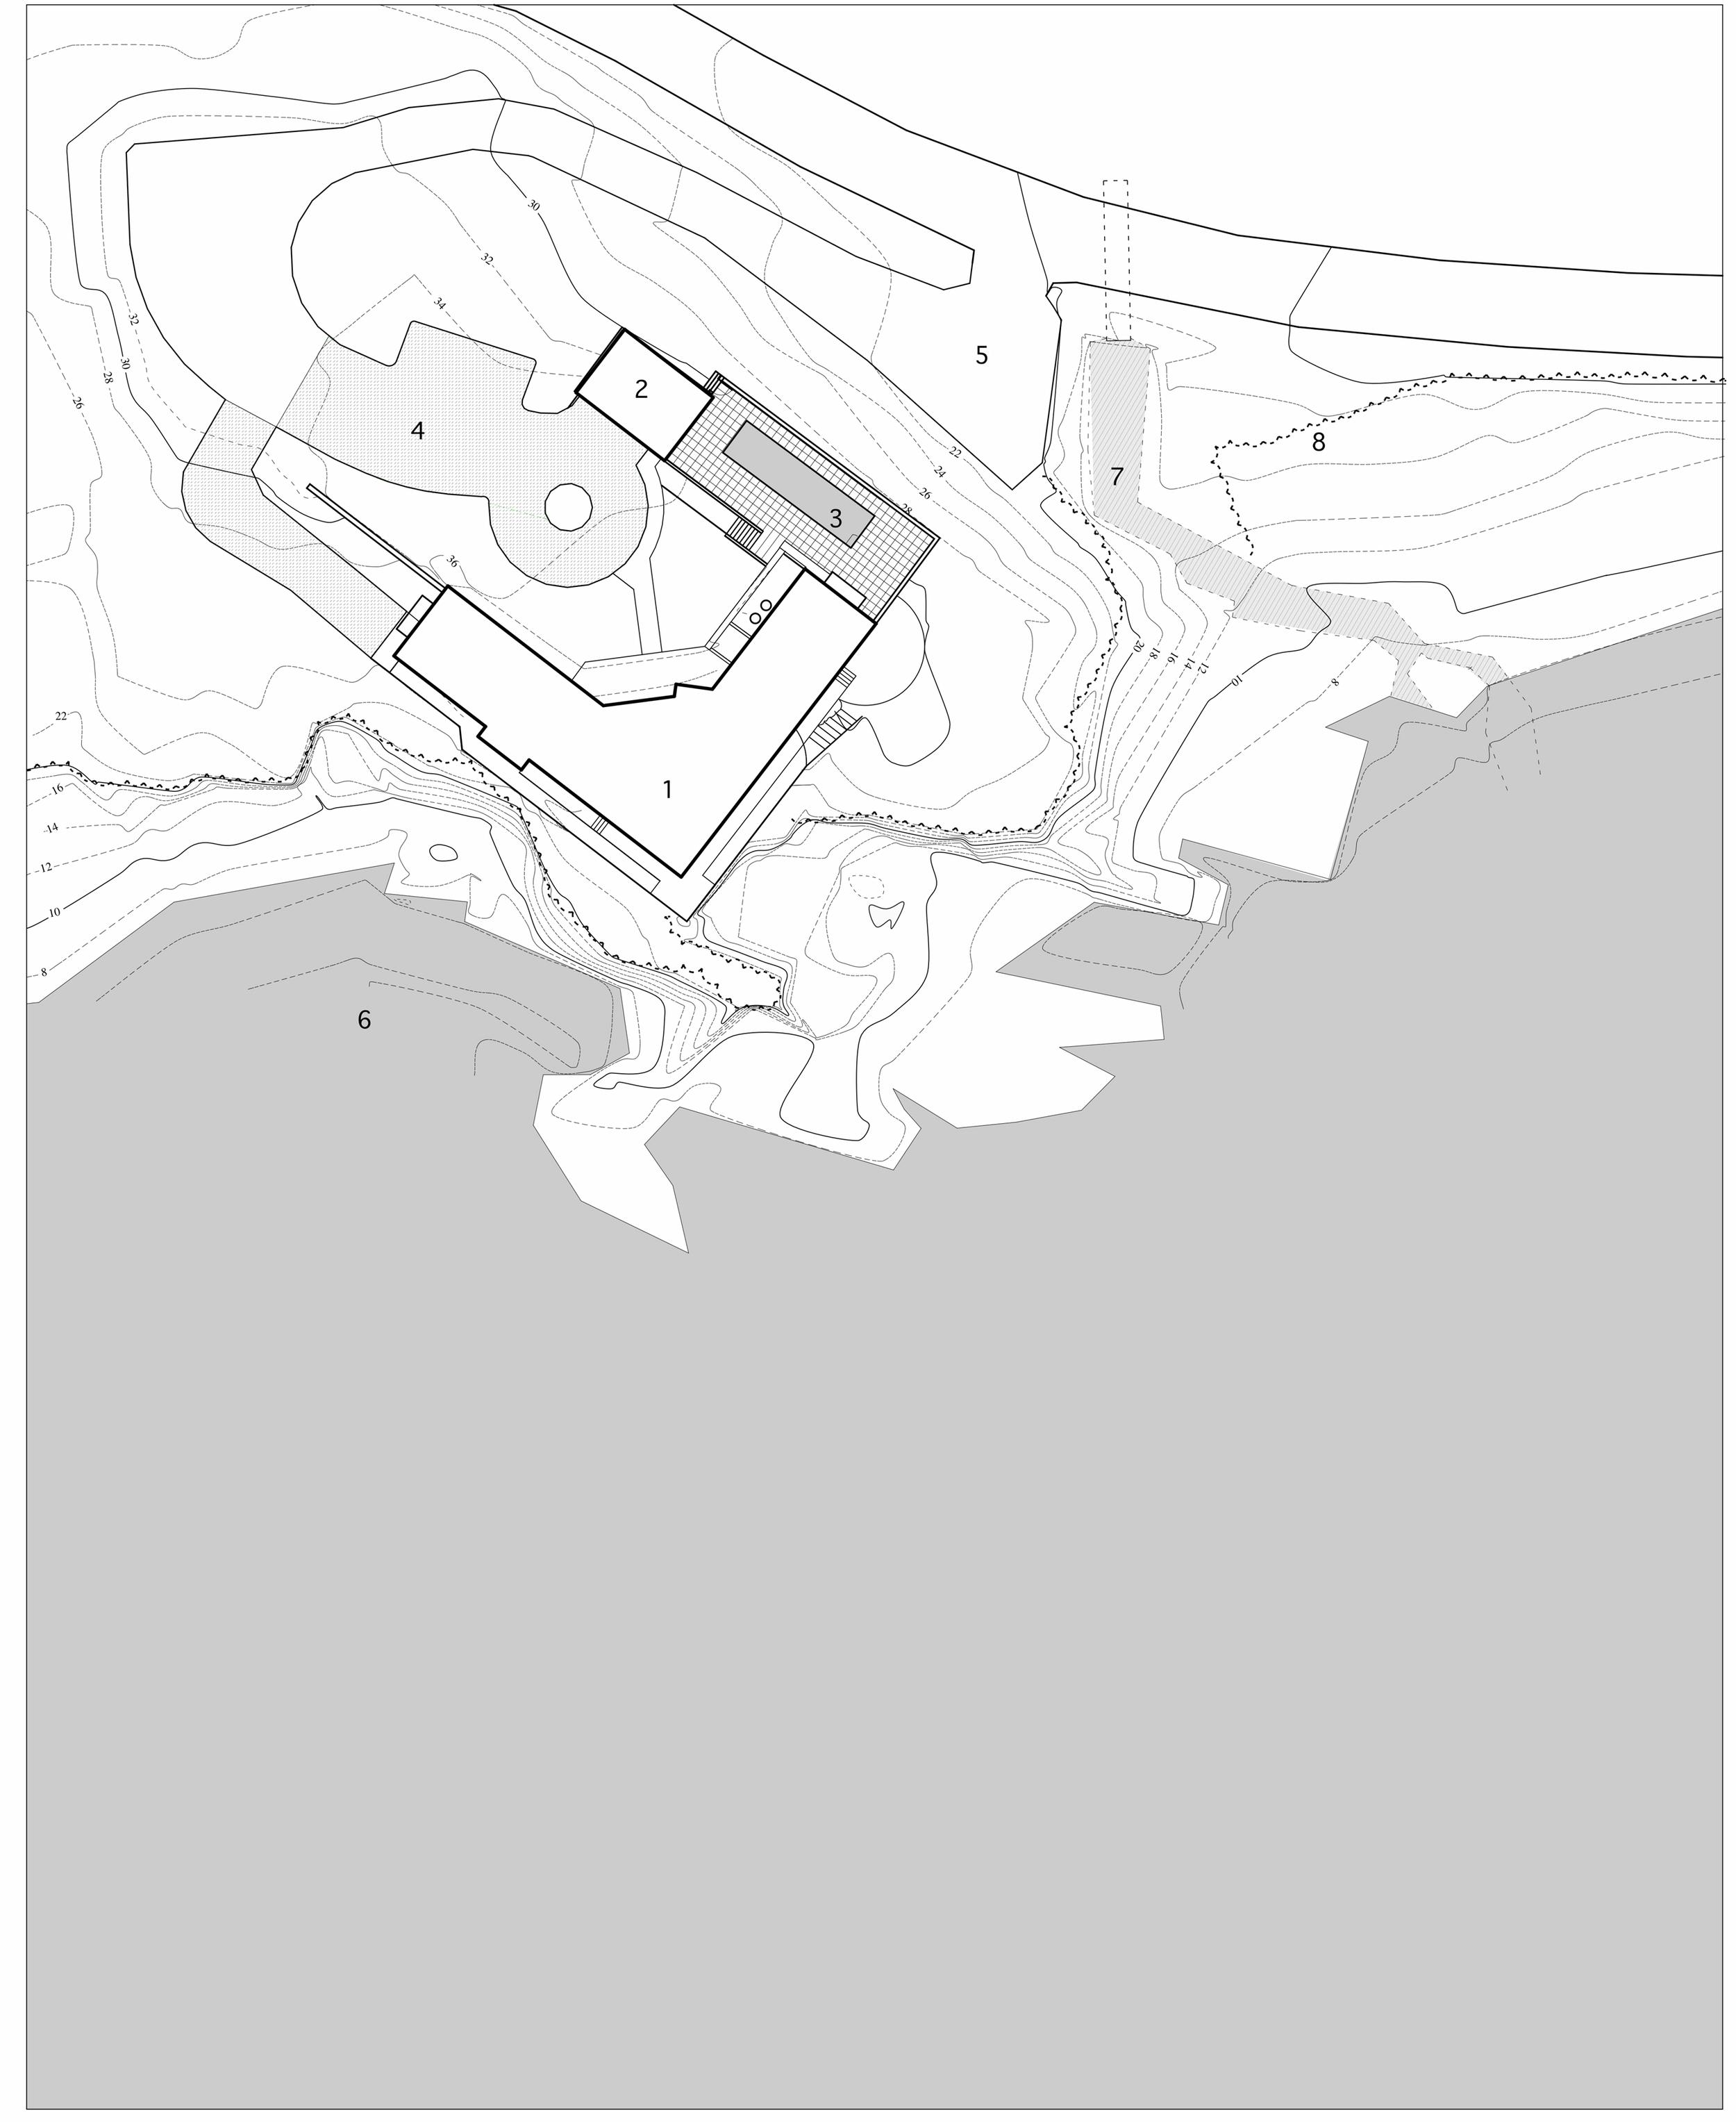 site plan: (1) house, (2) garage, (3) swimming pool, (4) entry drive, (5) driveway, (6) coastline, (7) stream, (8) edge of site